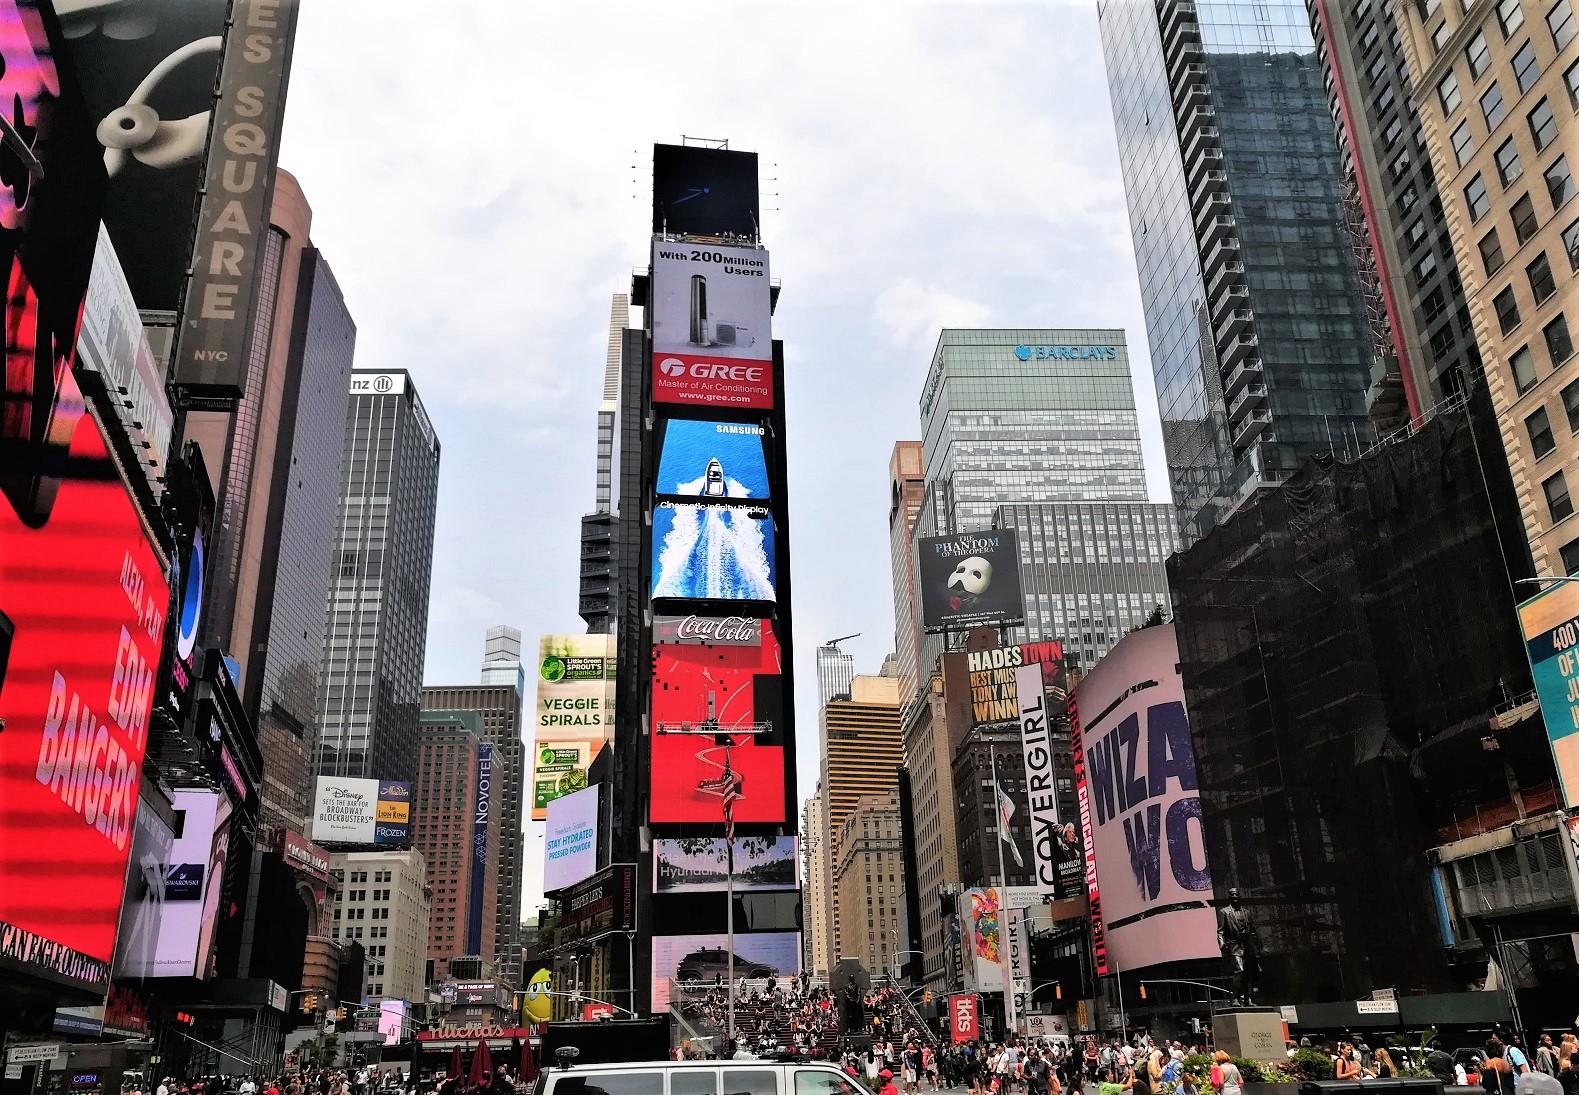 Das bunte Treiben am Times Square